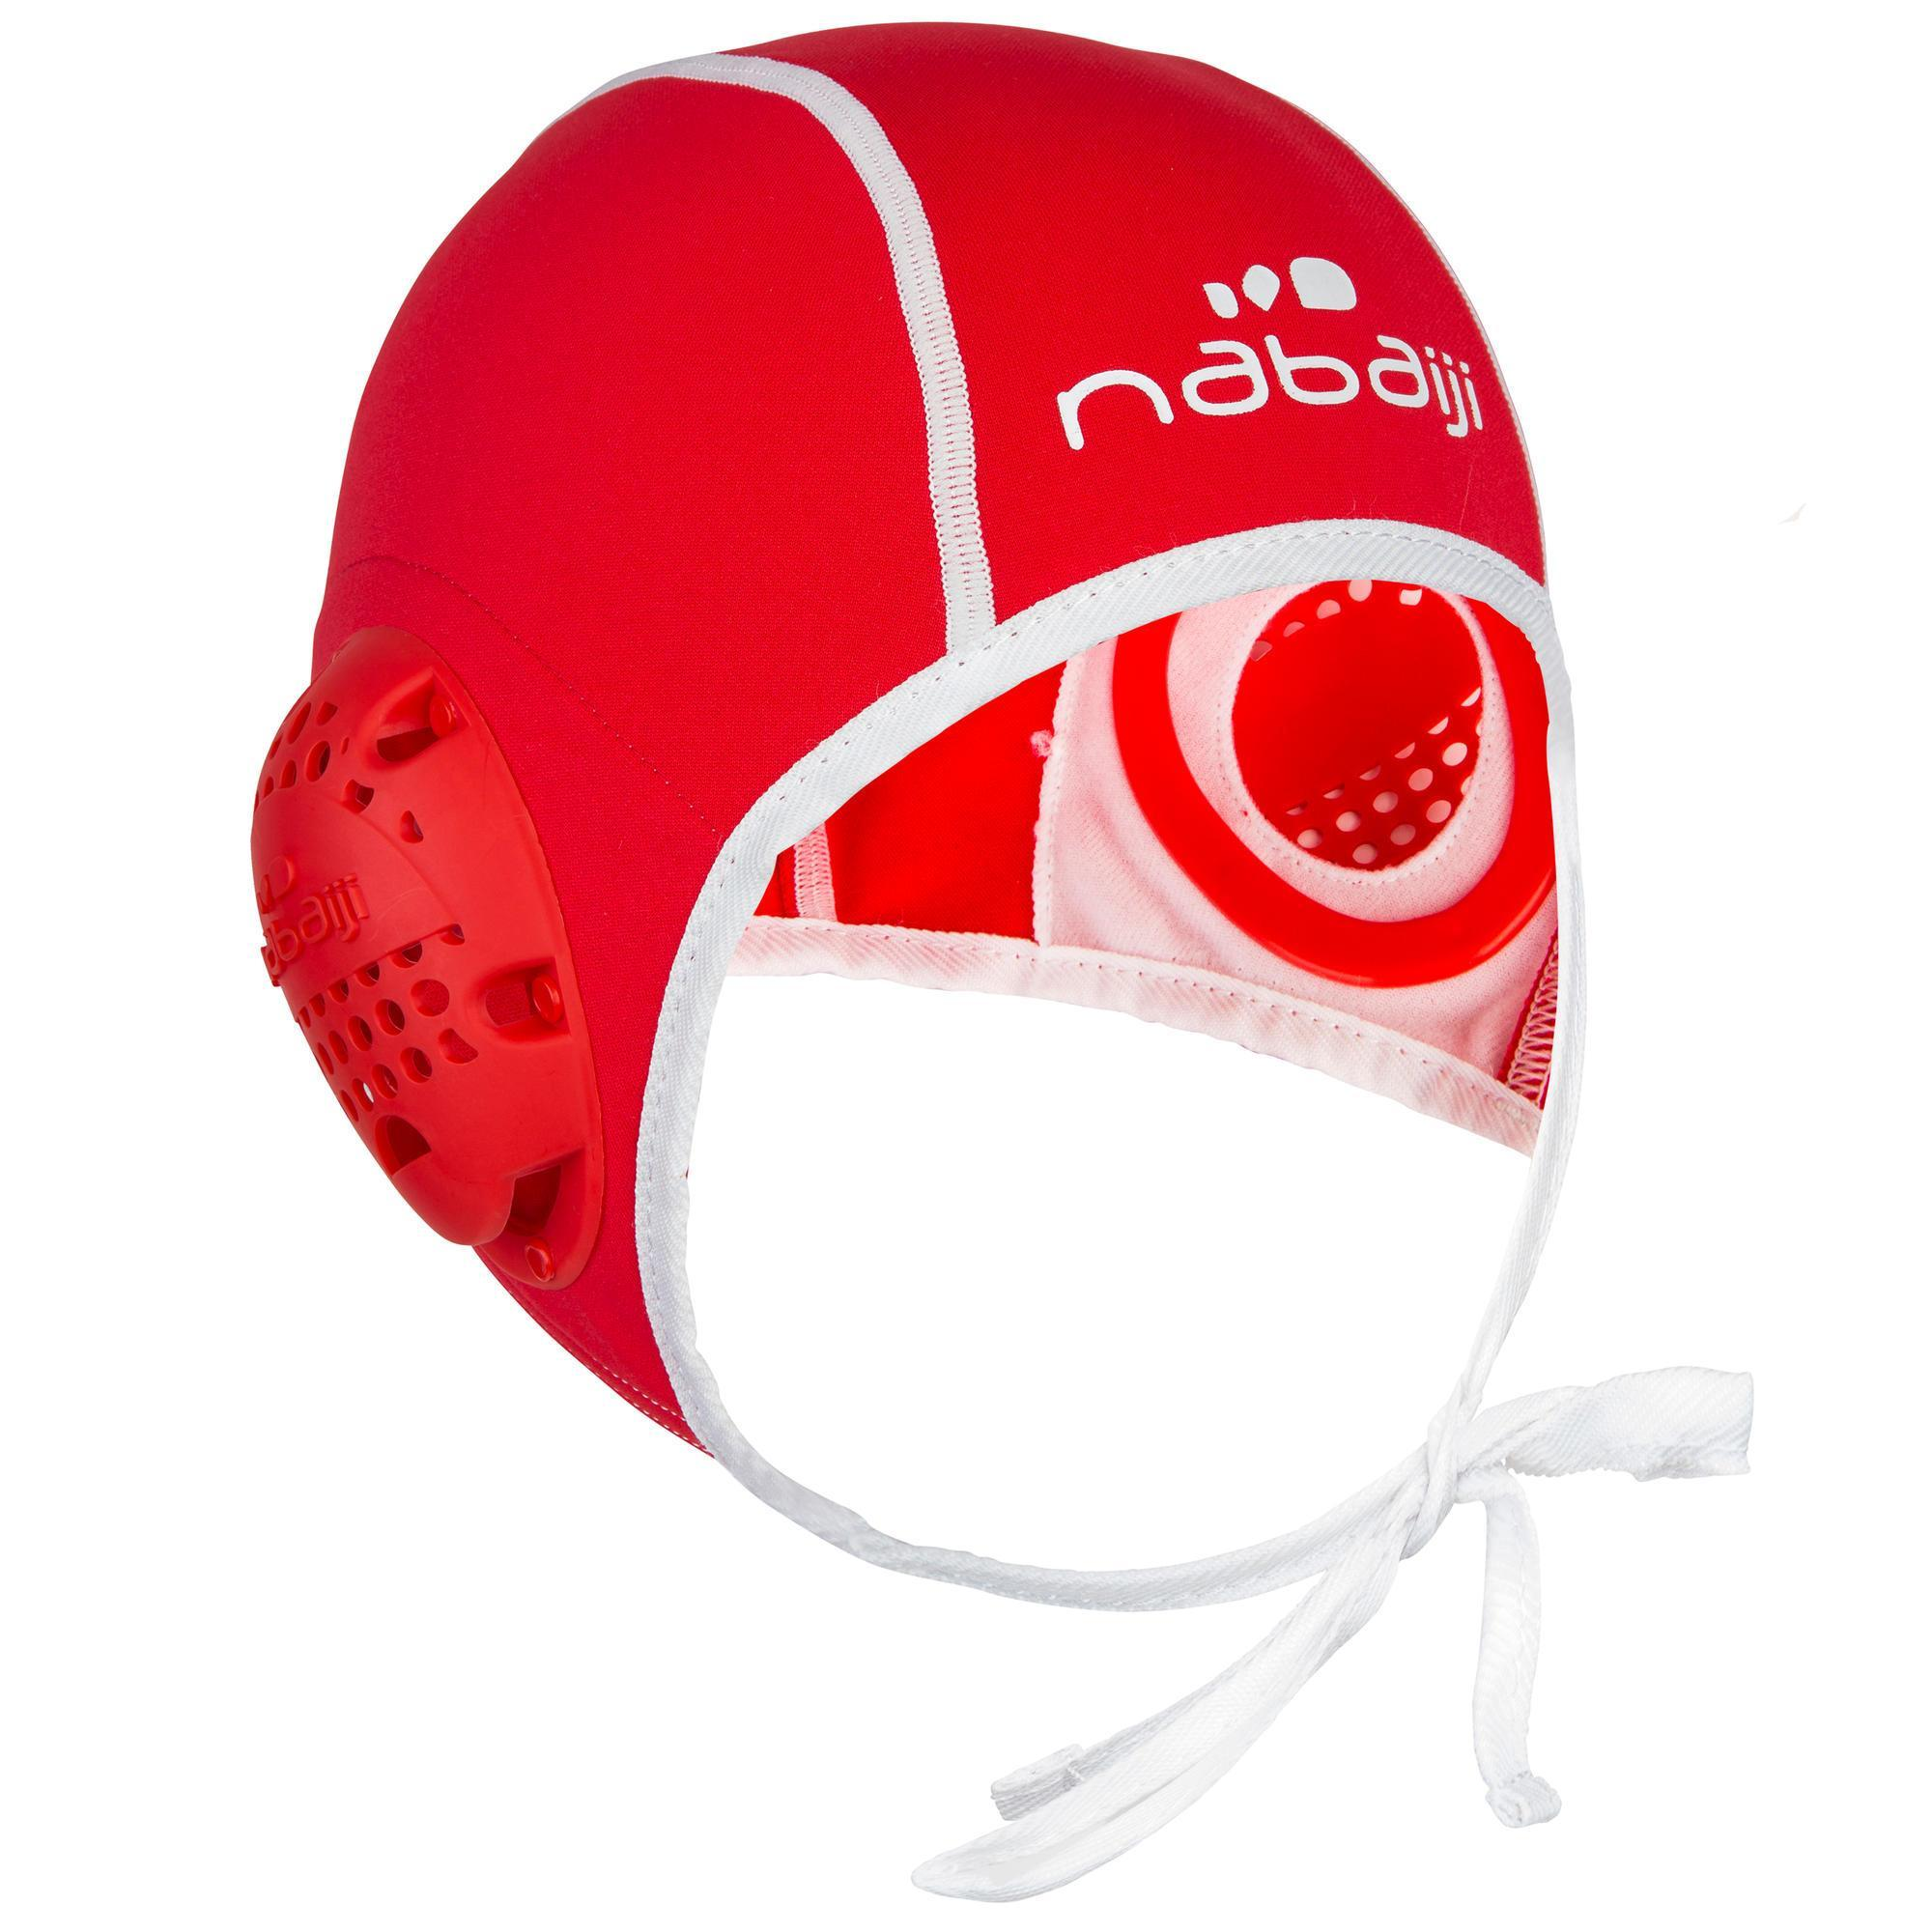 Wasserball-Kappe Water Polo 500 Erwachsene | Accessoires > Caps > Sonstige Caps | Watko